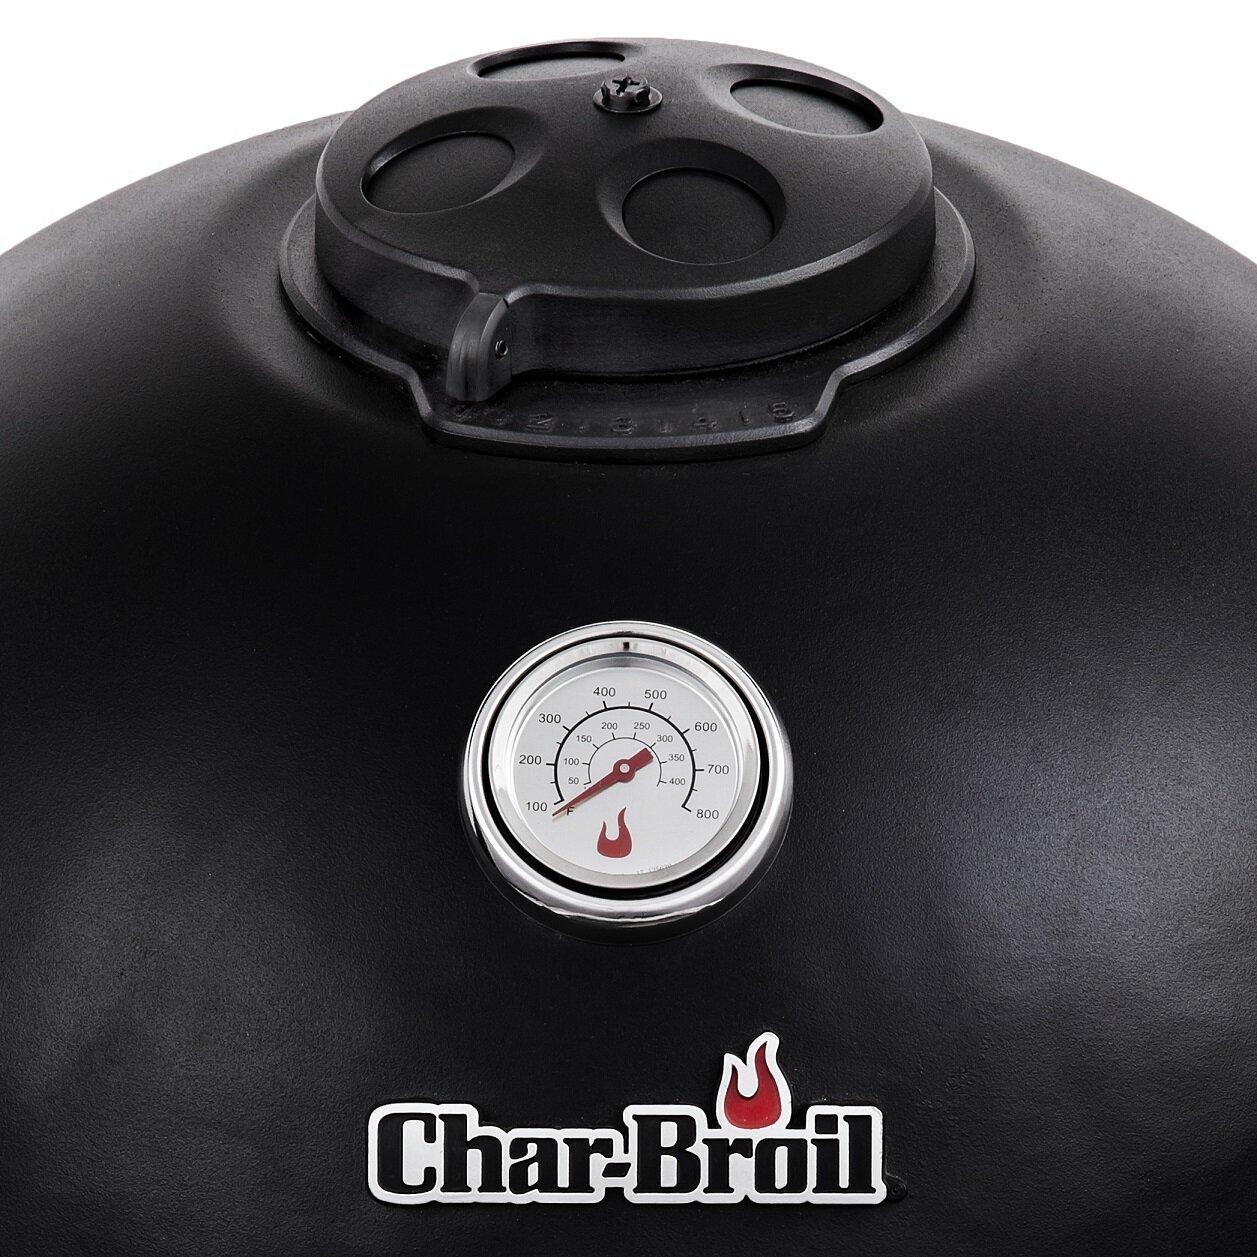 Char-Broil Kamander Charcoal BBQ Grill image